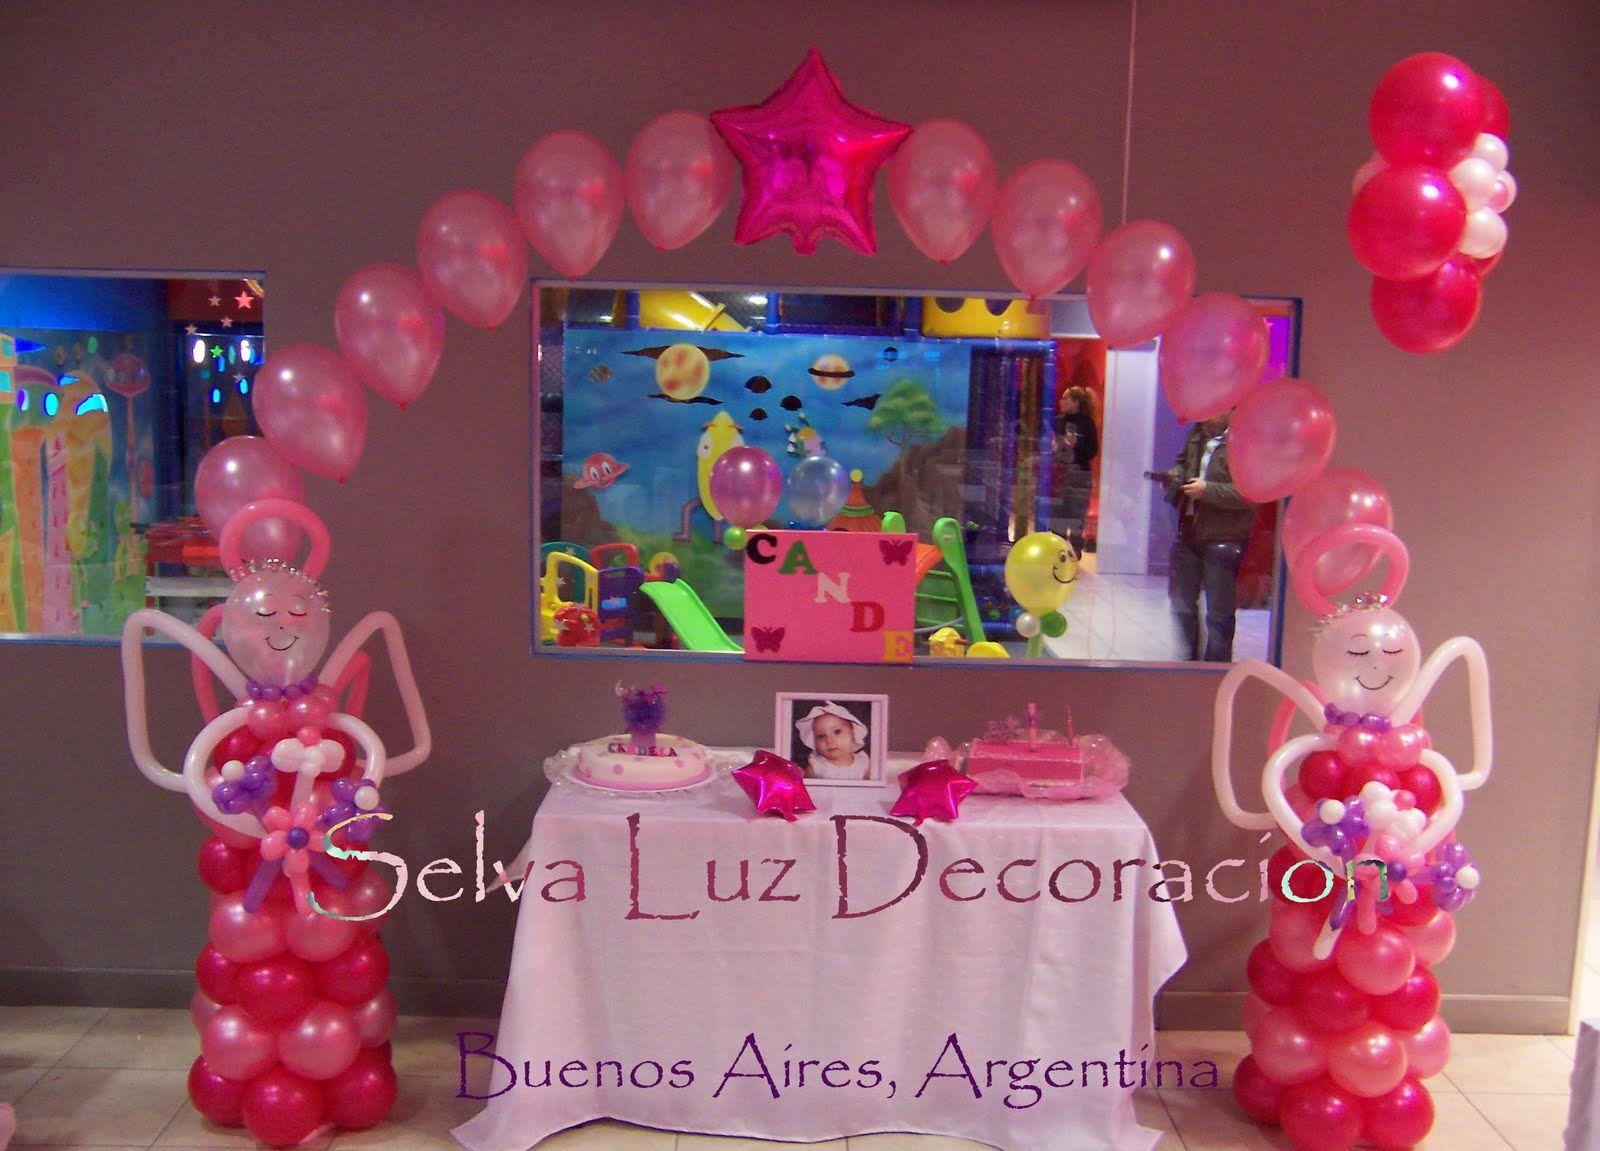 Decoracion de arcos para xv selva luz decoraci n con for Decoracion con globos